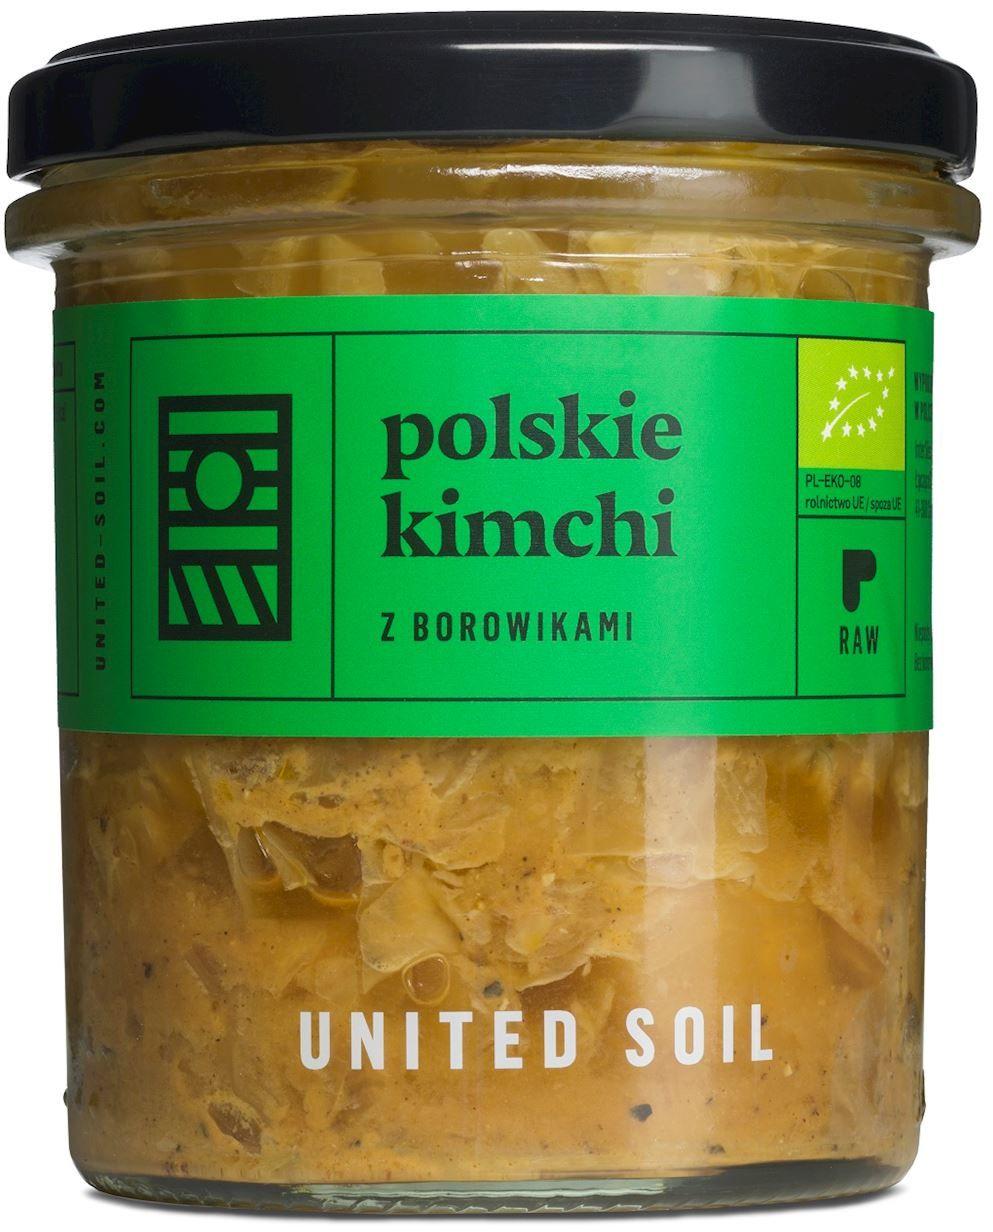 Polskie kimchi z borowikami bio 290 g - united soil